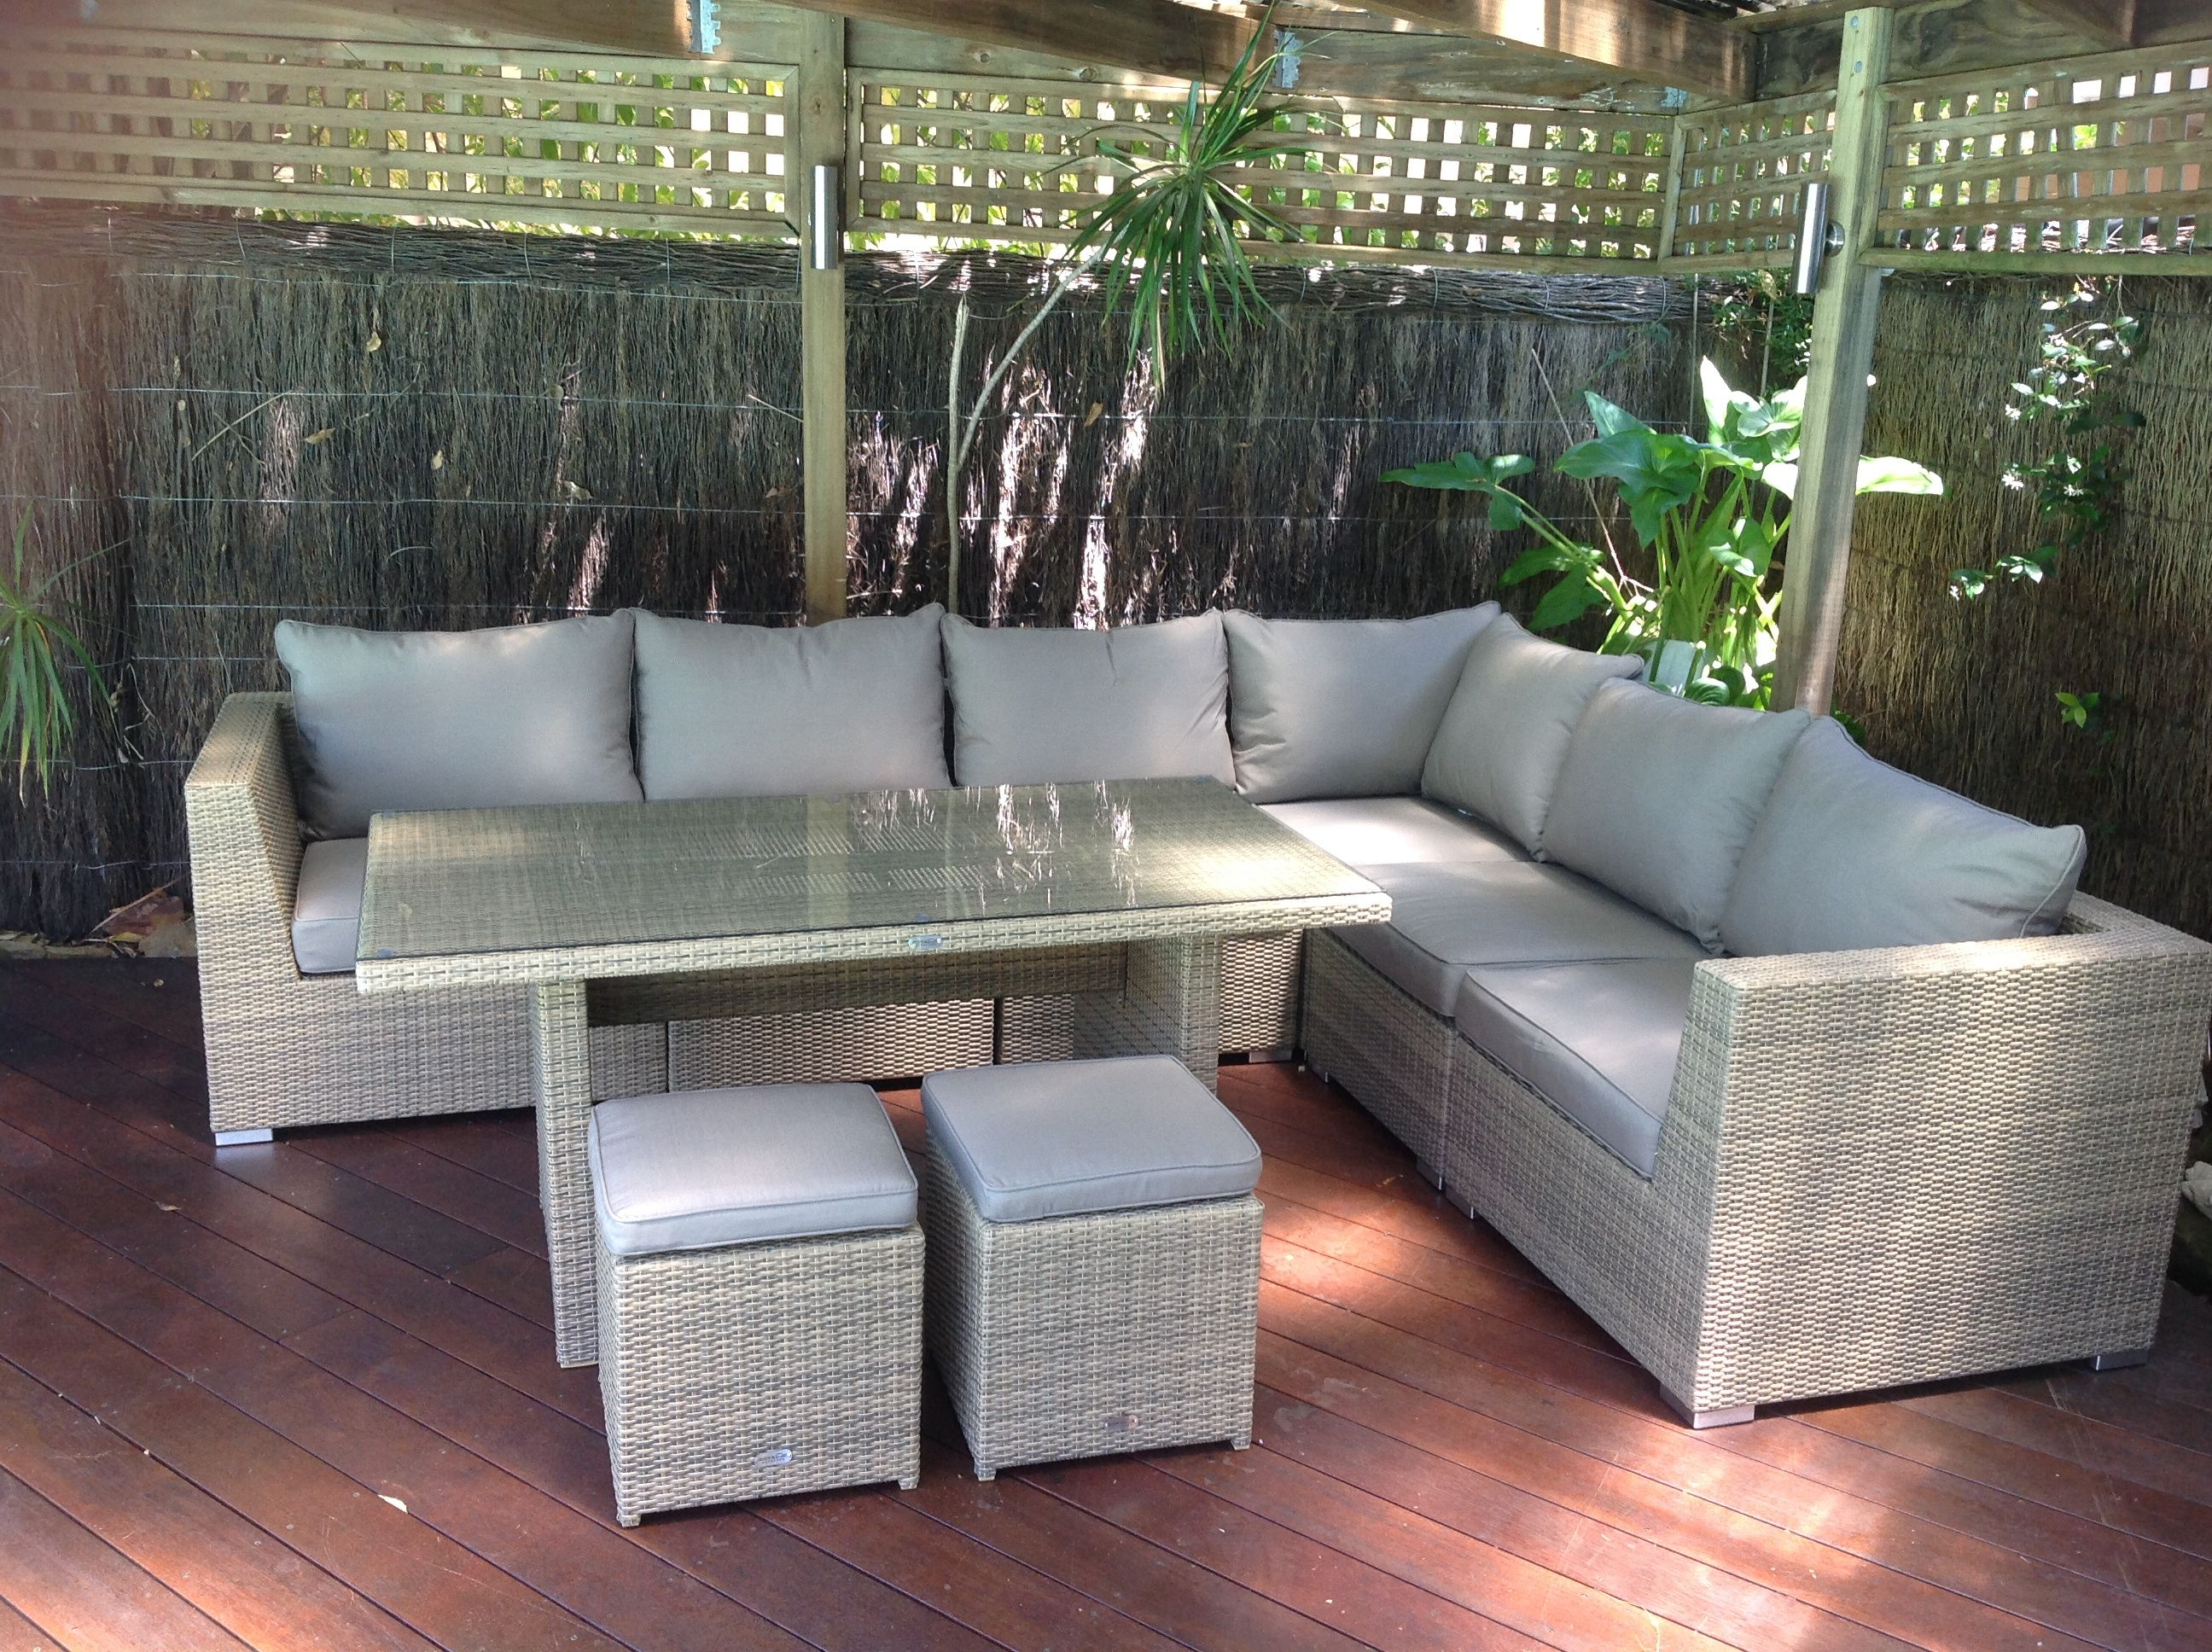 luxuri best sessel cupboard the wicker lounge design c beautiful furniture table s outdoor luxurios of chair